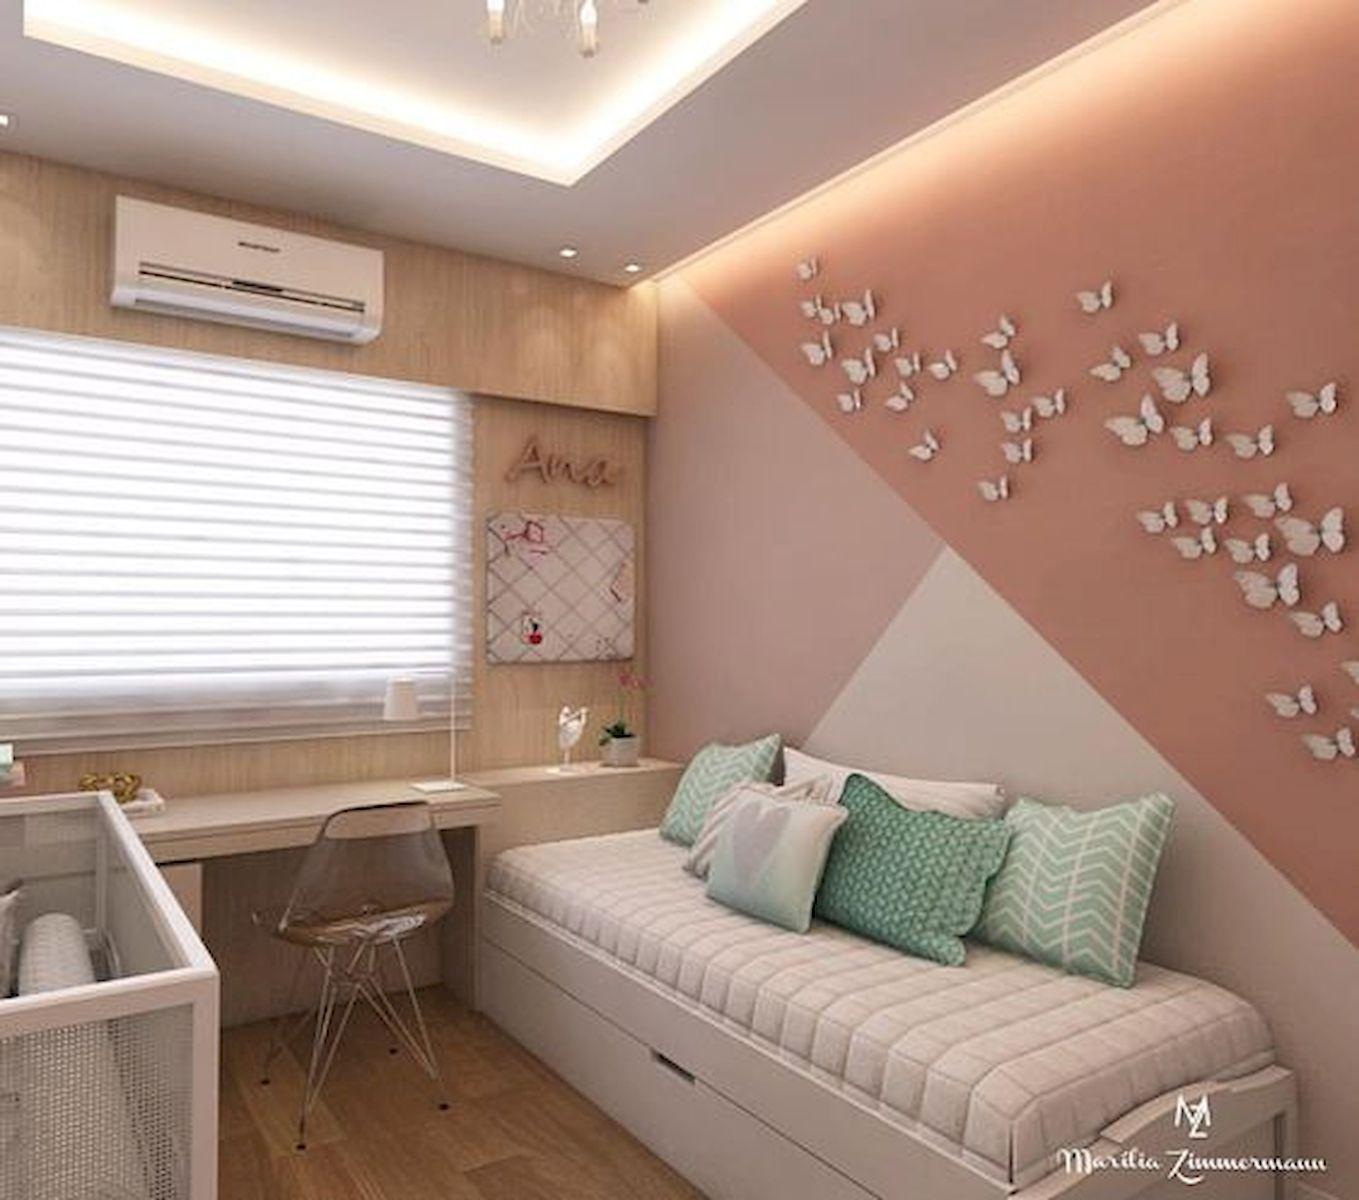 Bedroom Wall Art Tumblr Bedroom Furniture Brisbane Bedroom Green Walls Kids Bedroom Color Ideas: 33 Best Geometric Wall Art Paint Design Ideas